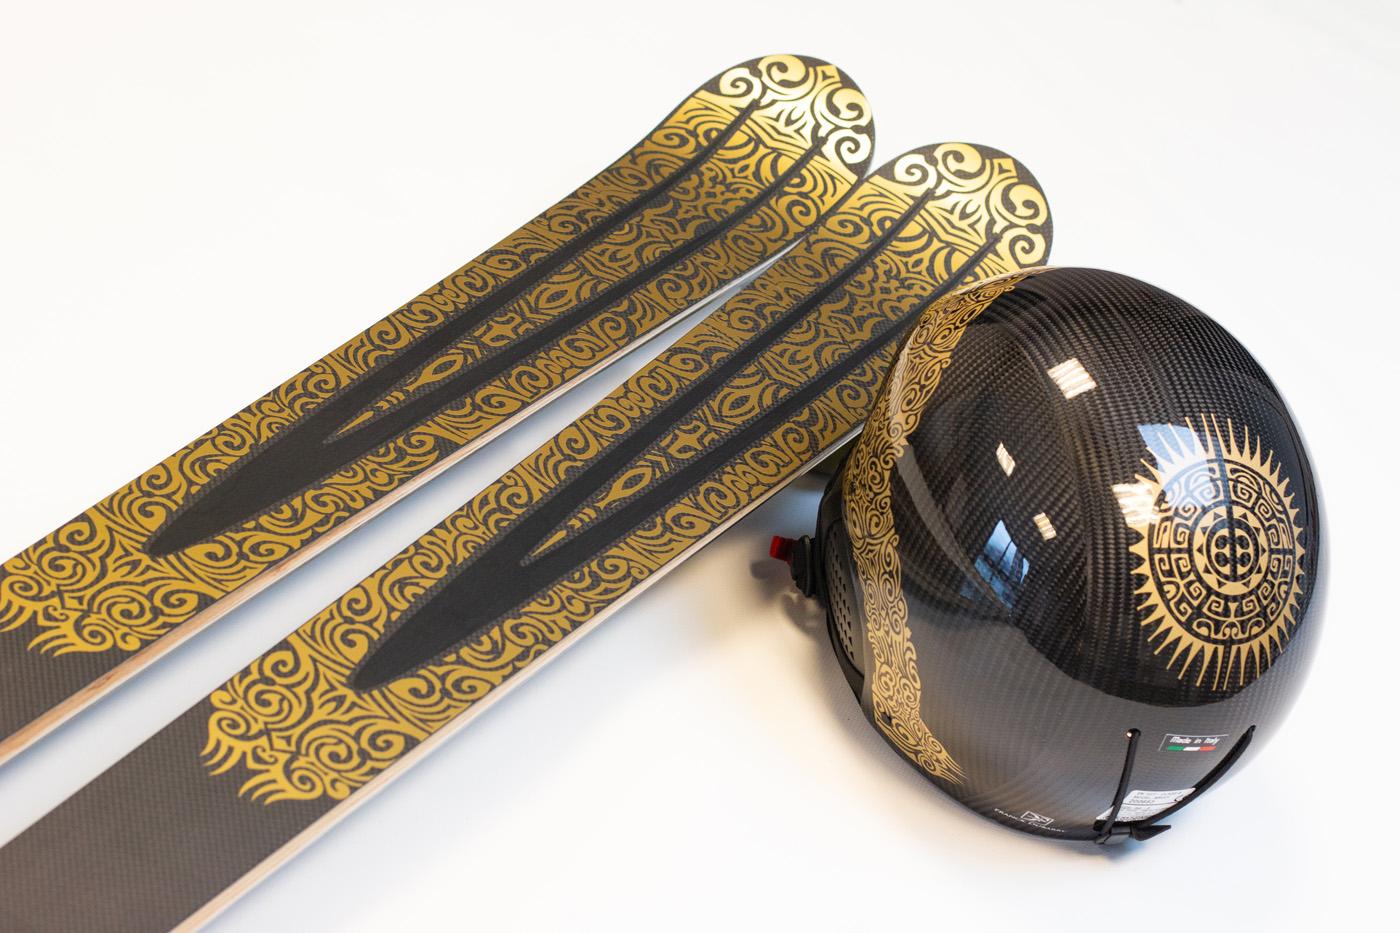 Branding-montfort-ski-casque